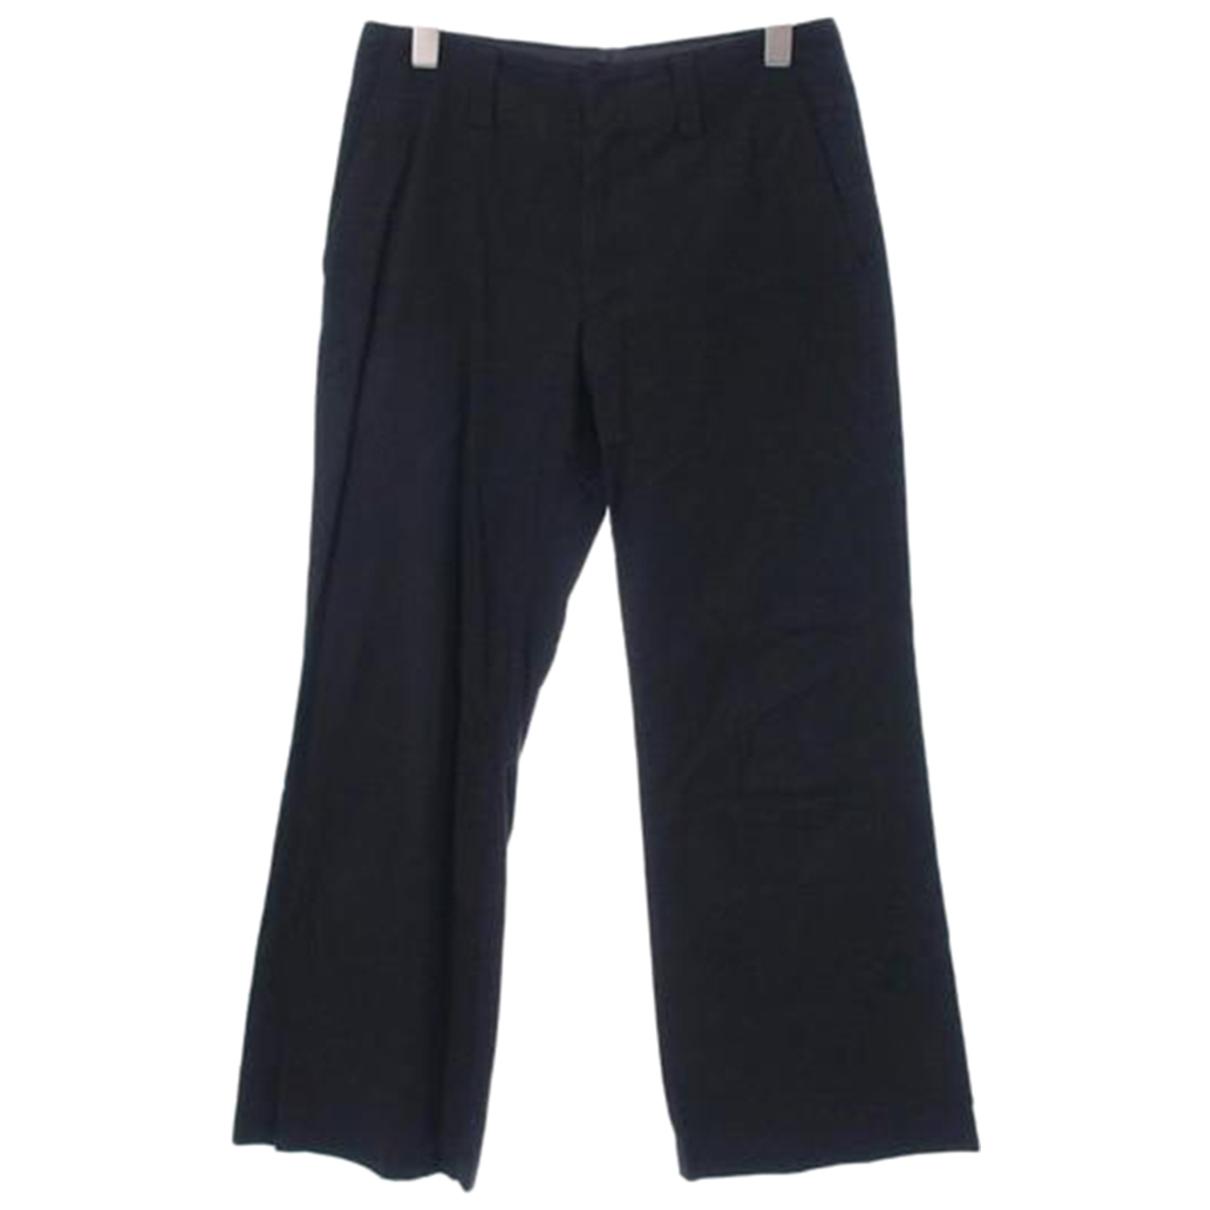 Junya Watanabe N Black Cotton Trousers for Women M International